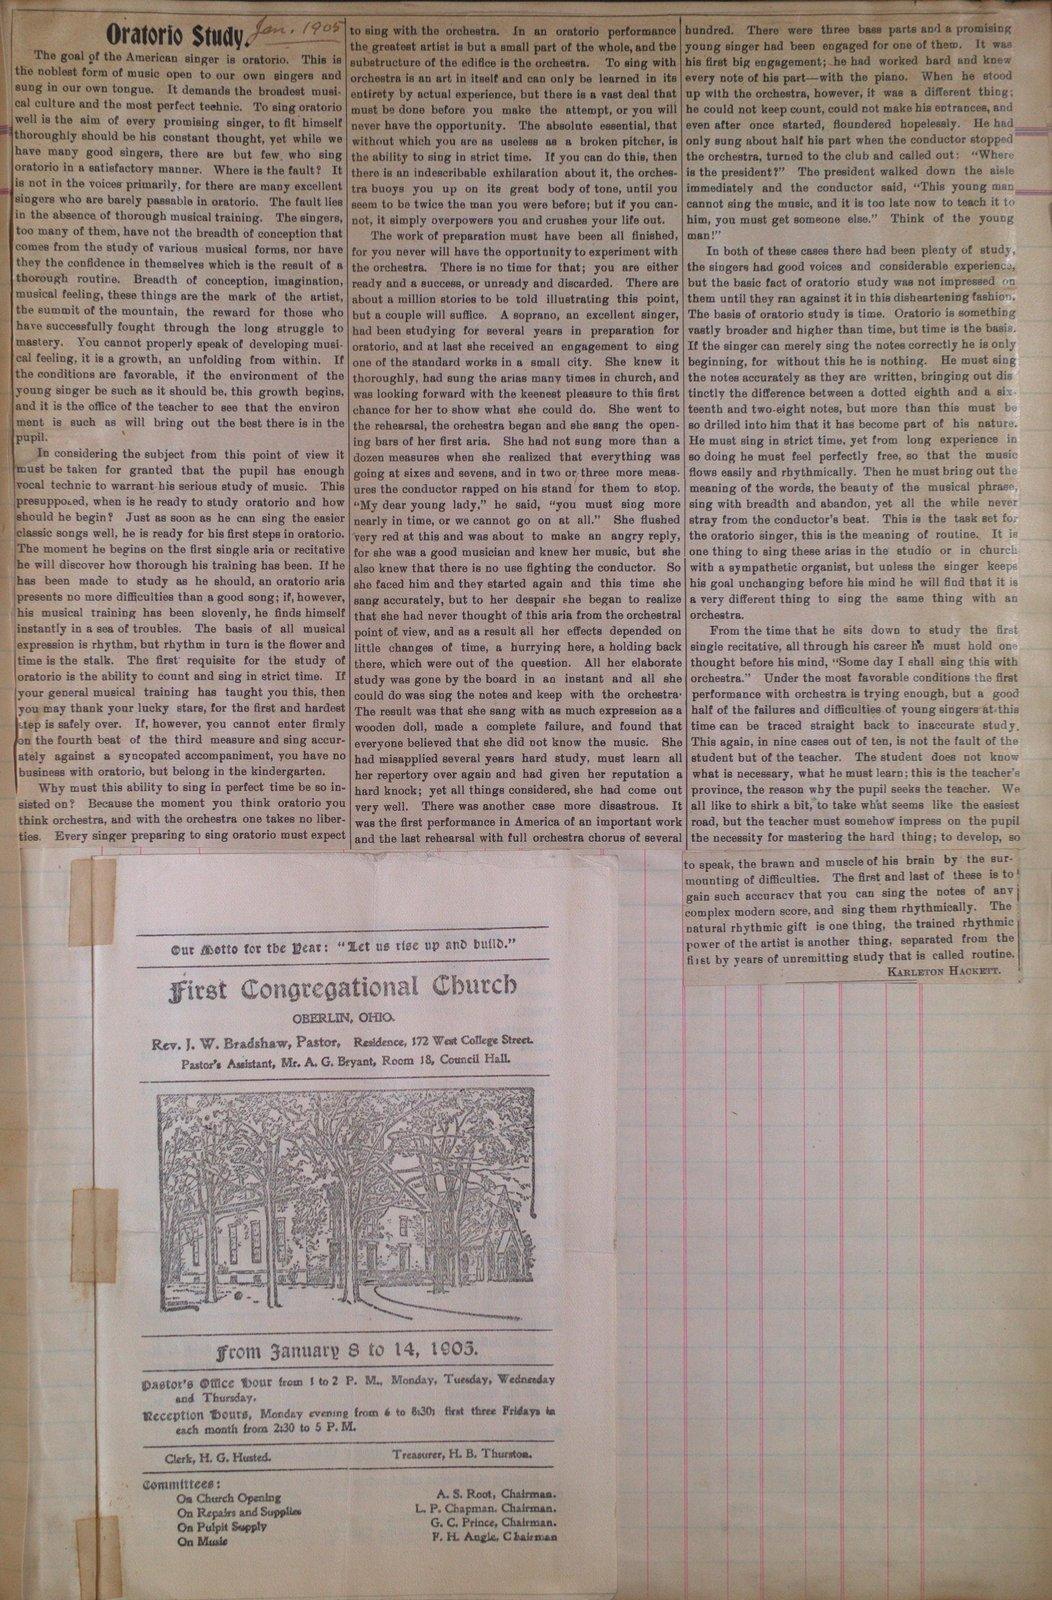 Teresa Vanderburgh's Musical Scrapbook #2 - Church Bulletin and an Article About Oratorio Study